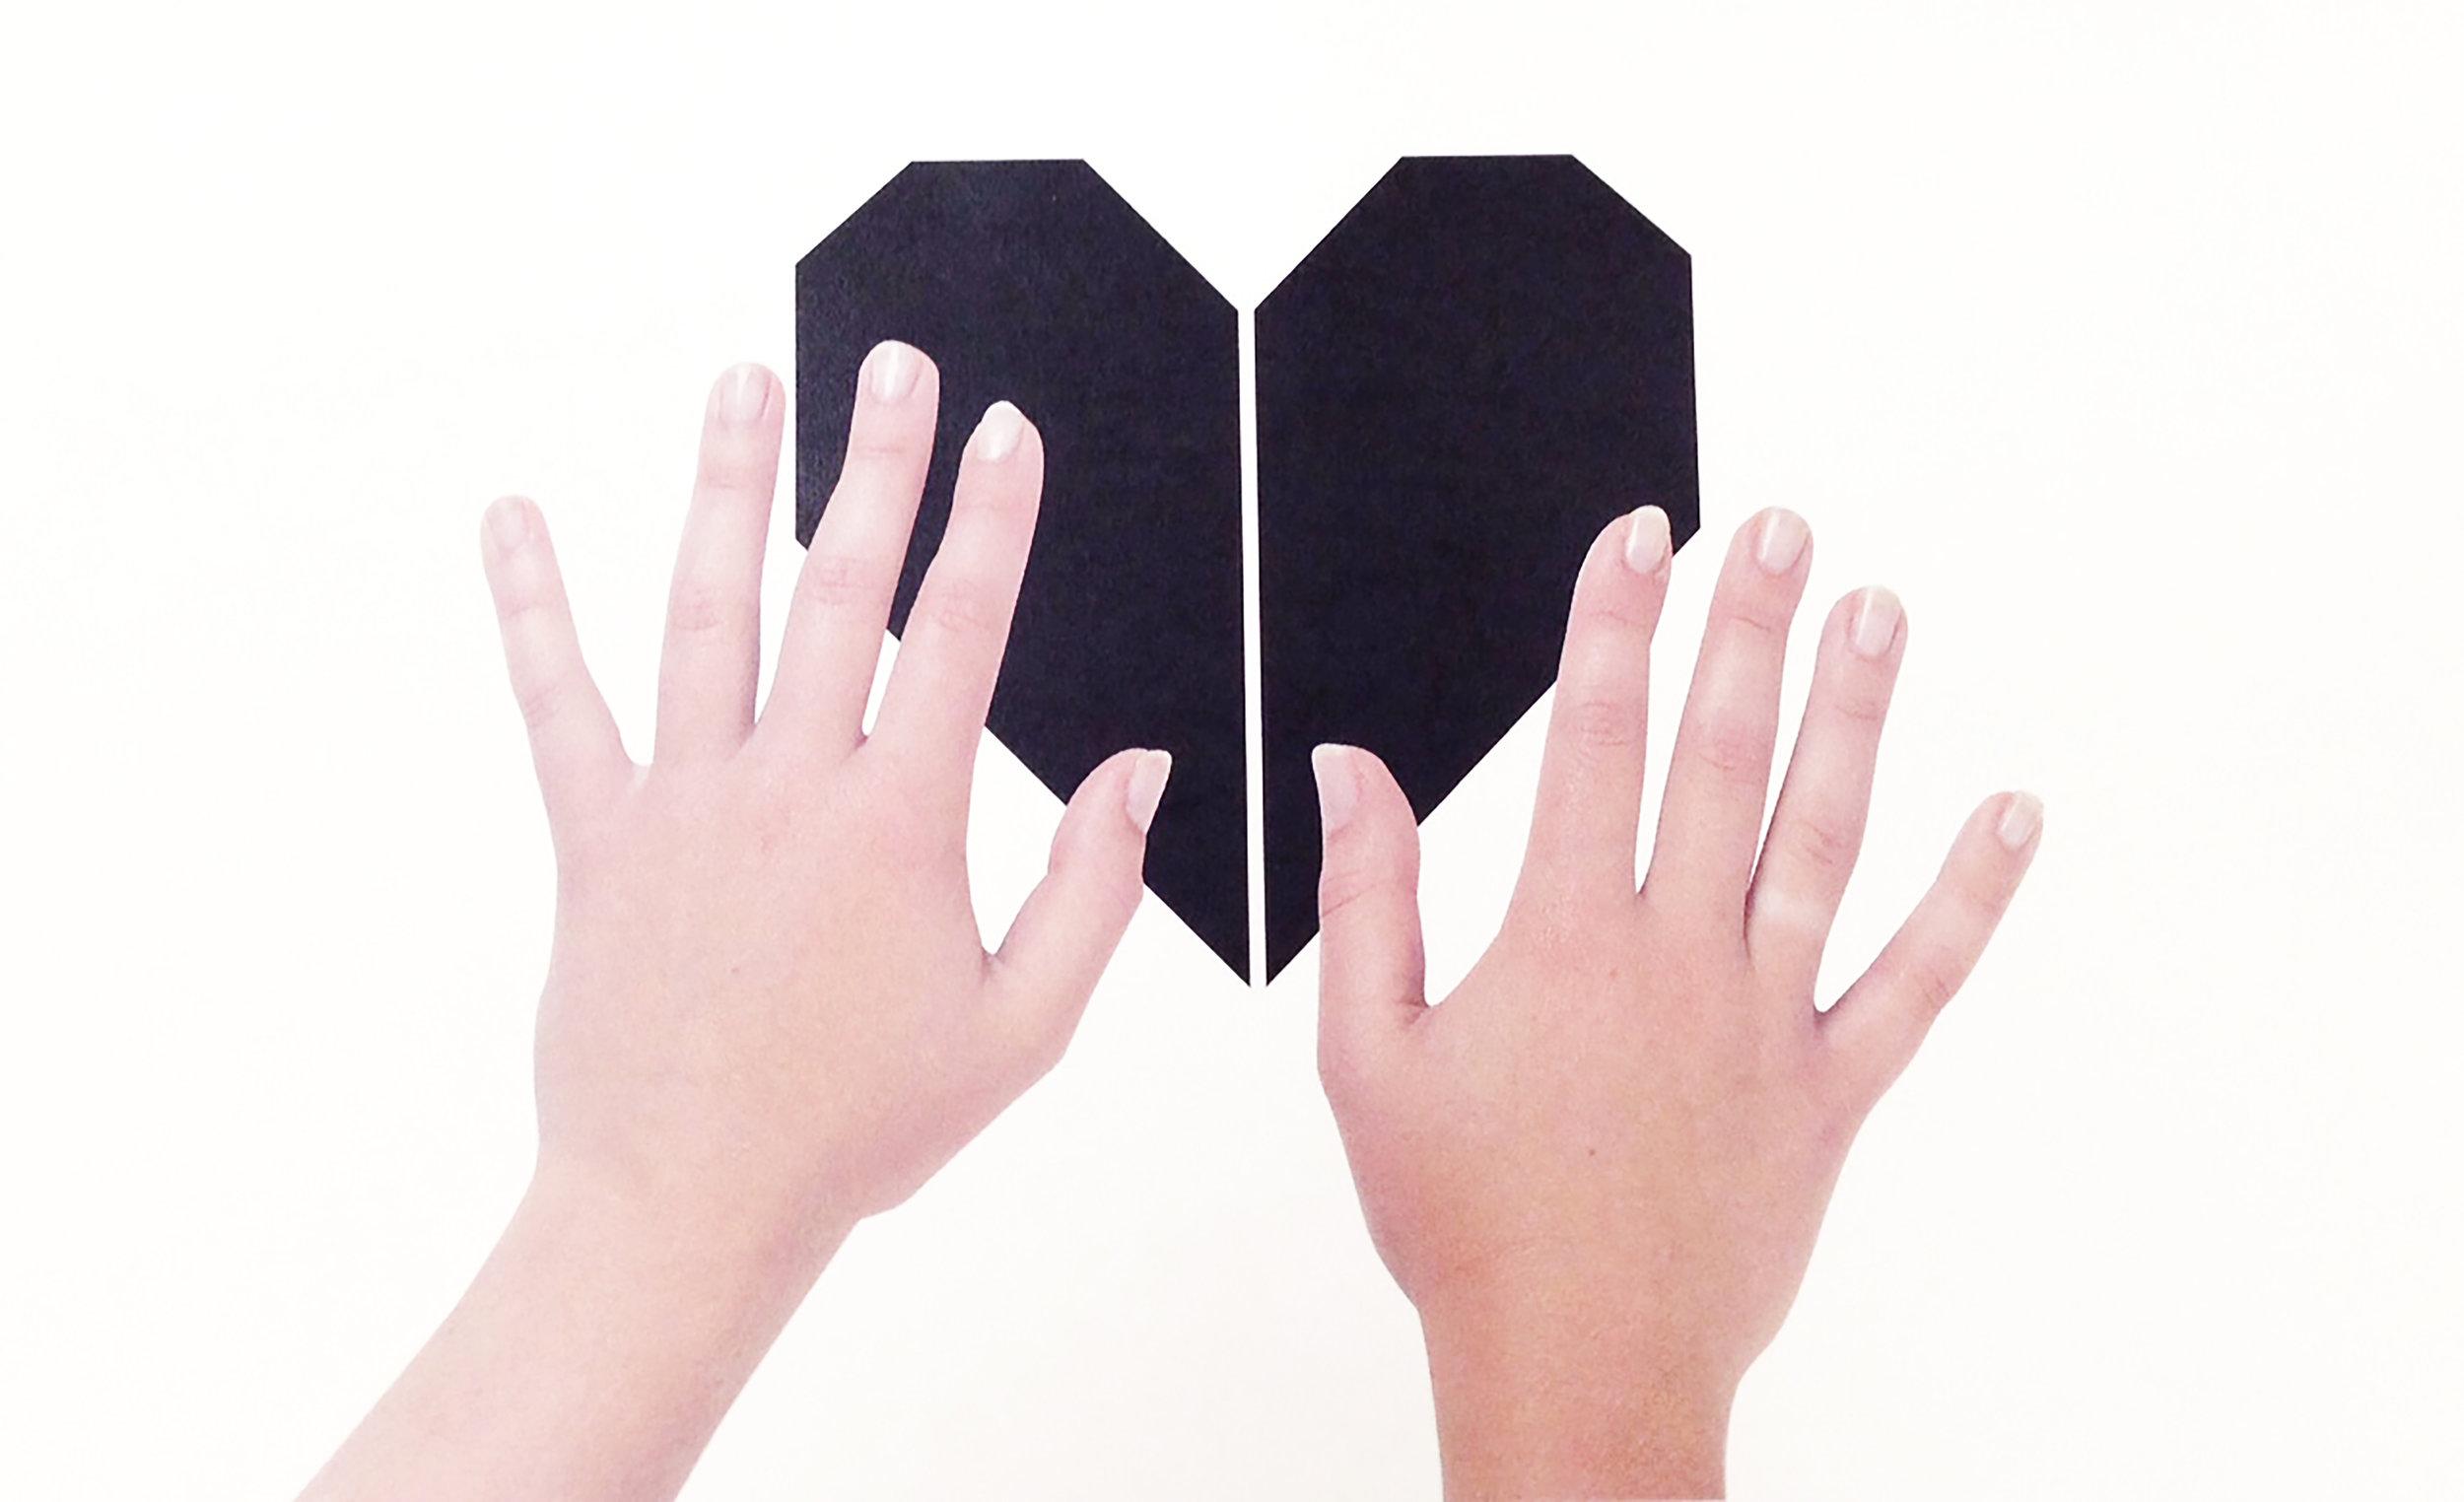 Mixed Reality hands copy.jpg